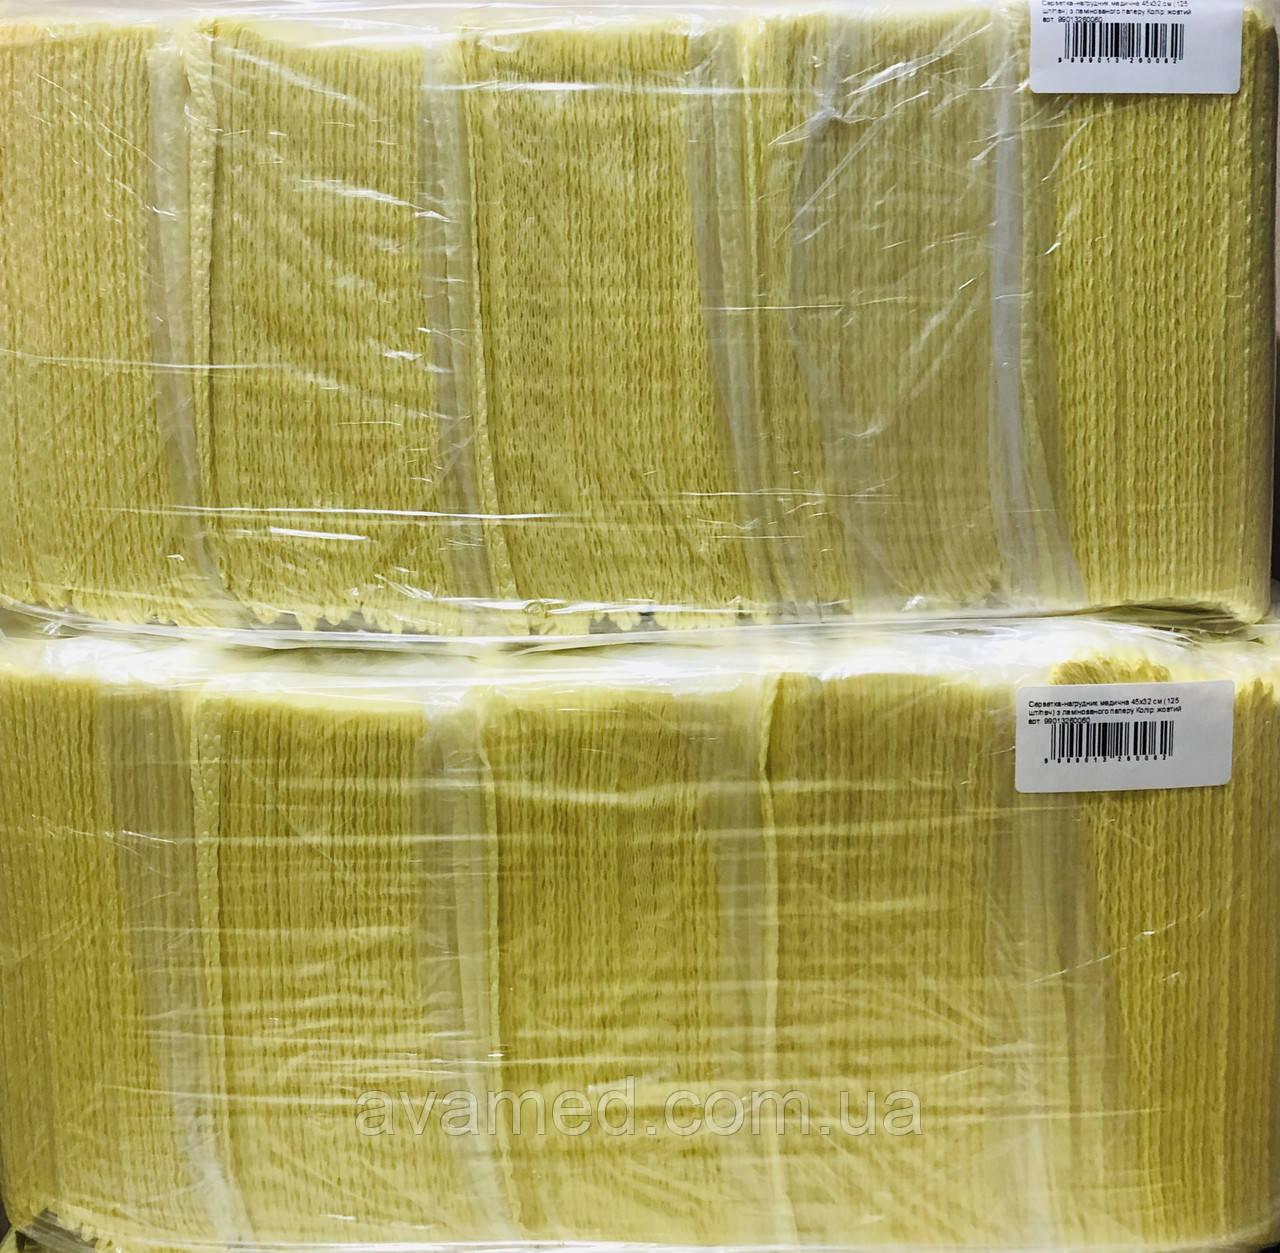 Серветка-нагрудник стоматологічна ламінована 3-х шарова 45х32 см (125 шт/пач.)